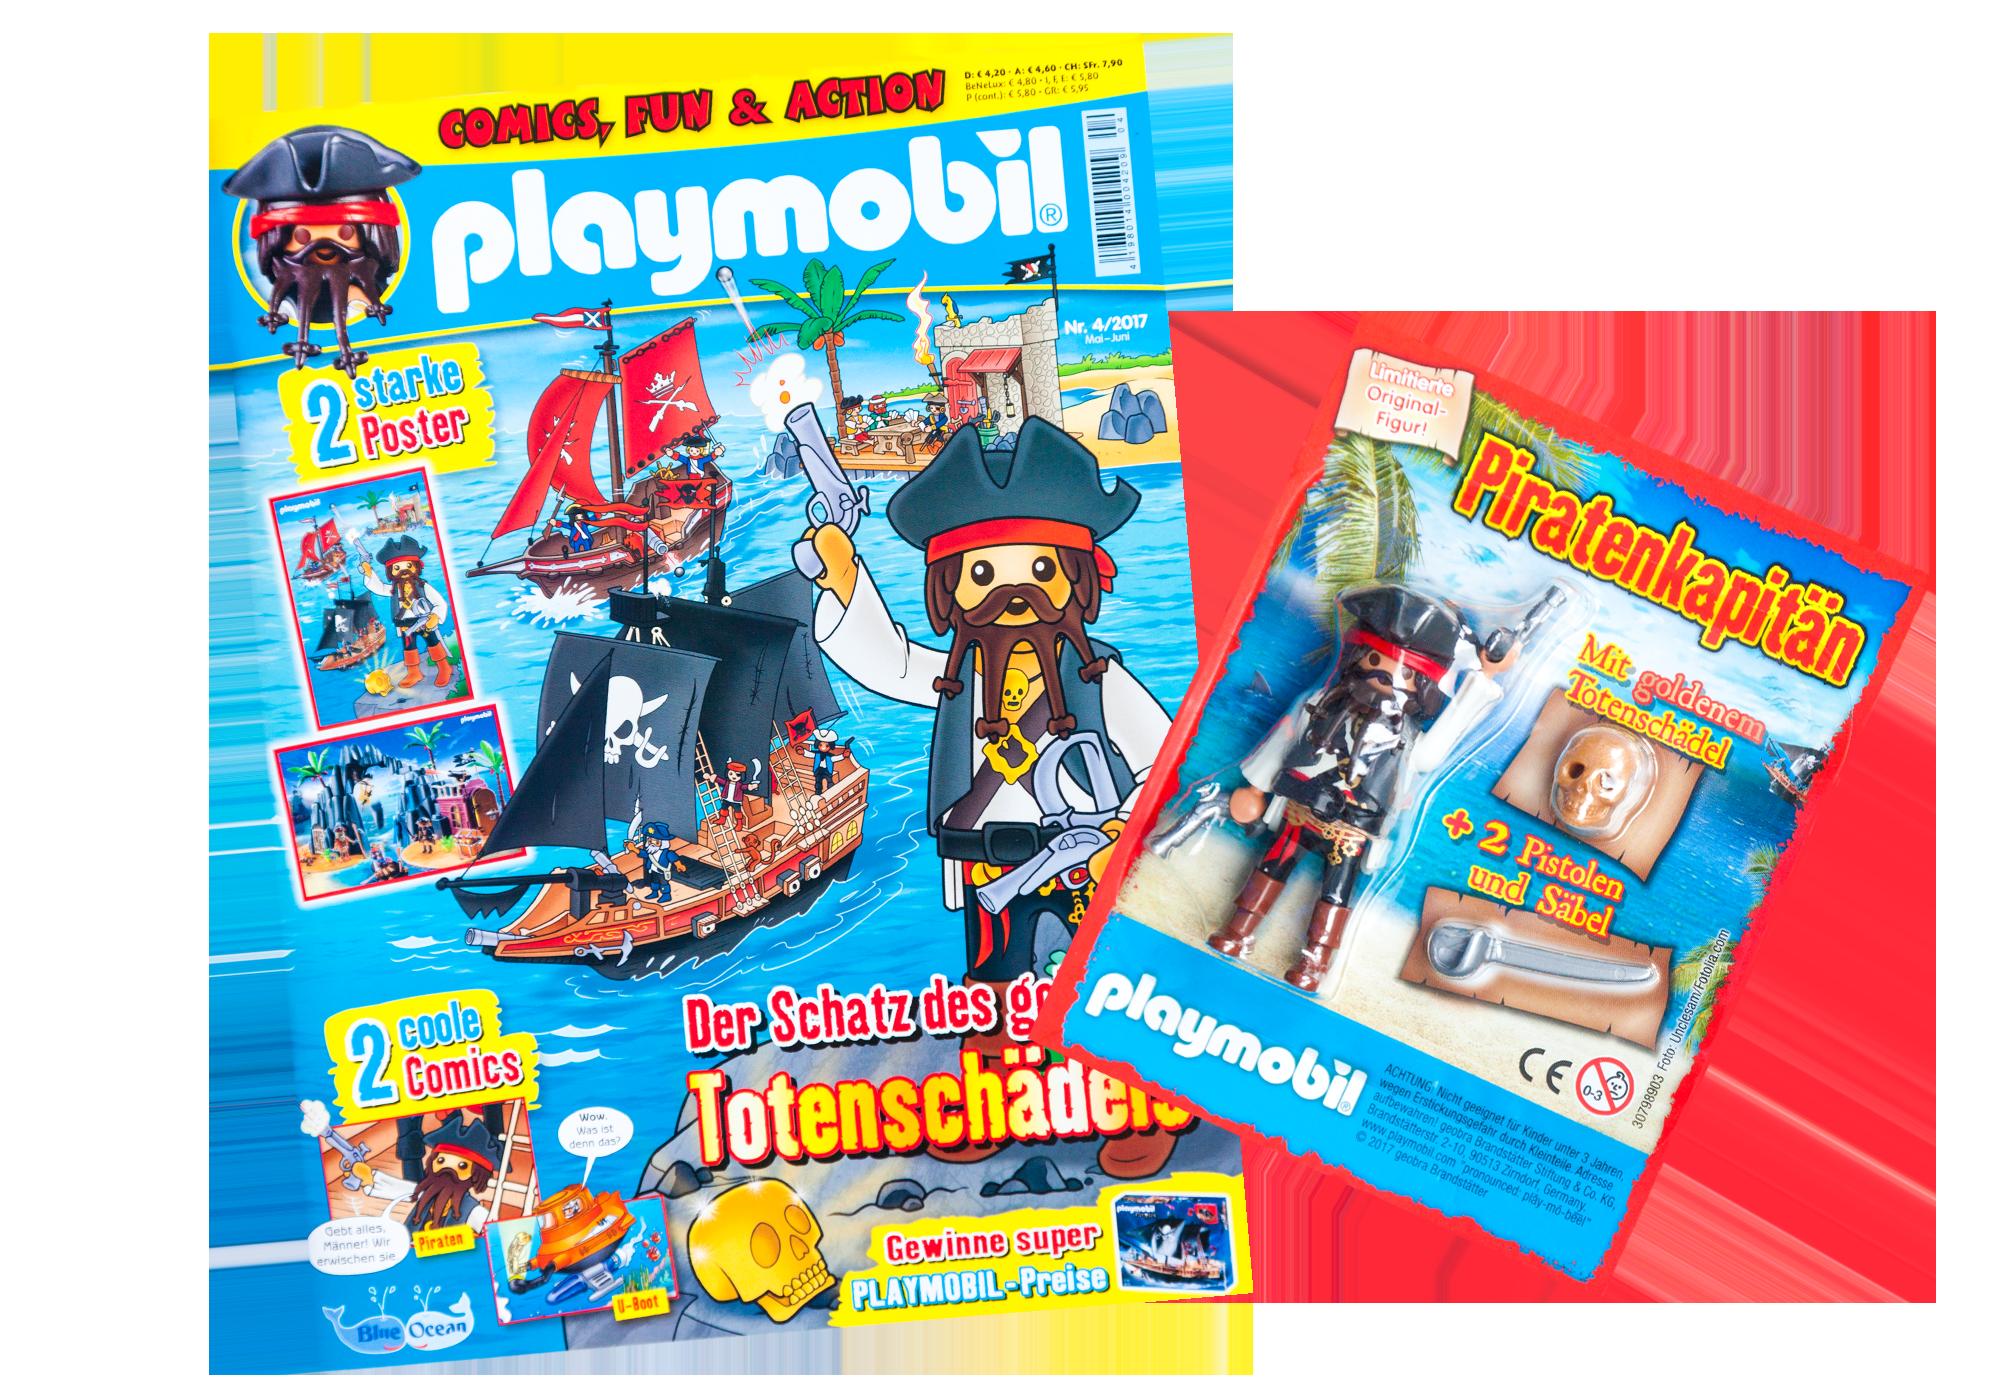 http://media.playmobil.com/i/playmobil/80590_product_detail/PLAYMOBIL-Magazin 4/2017 (Heft 53)